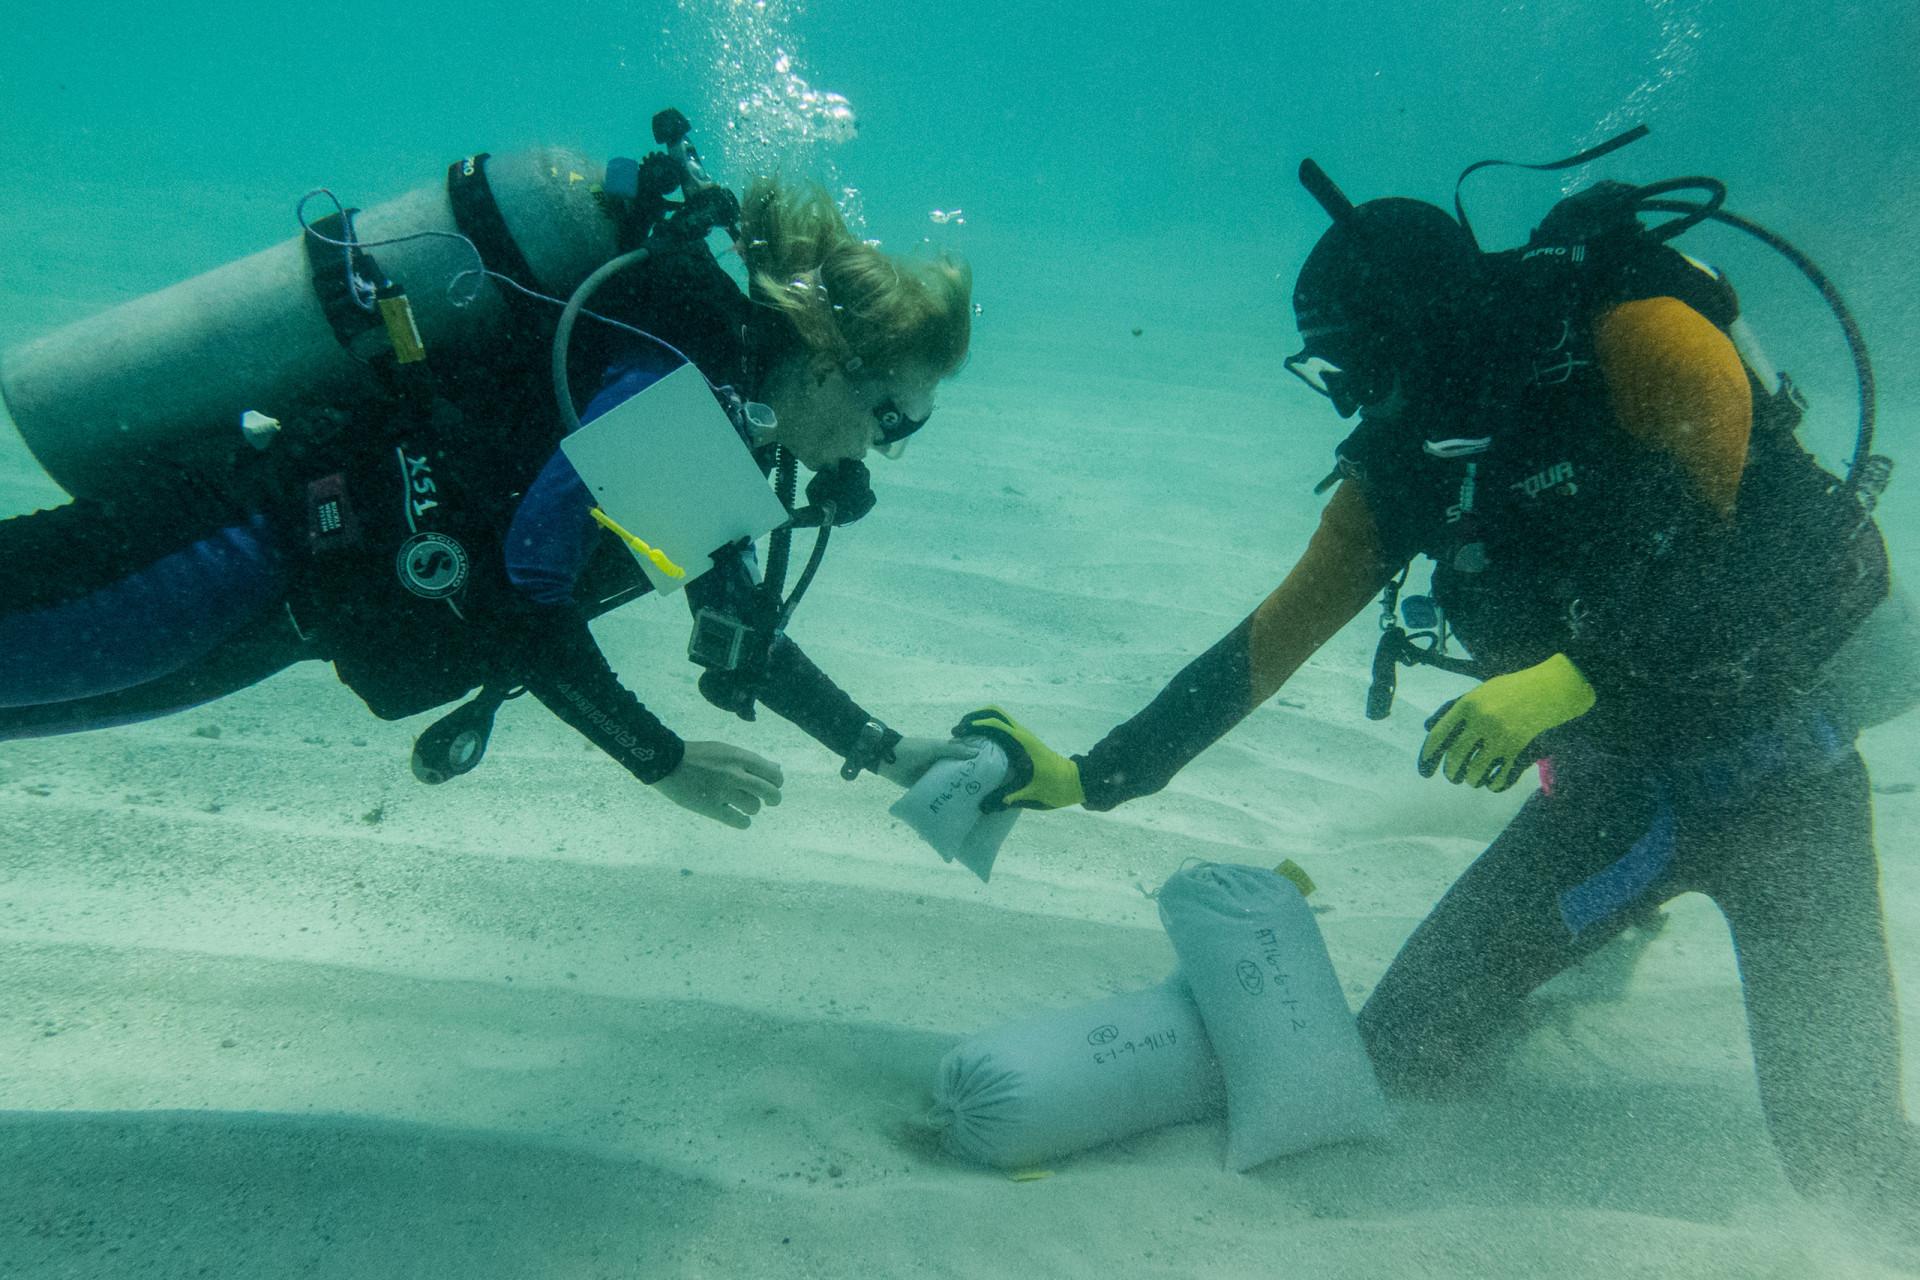 Declining reefs